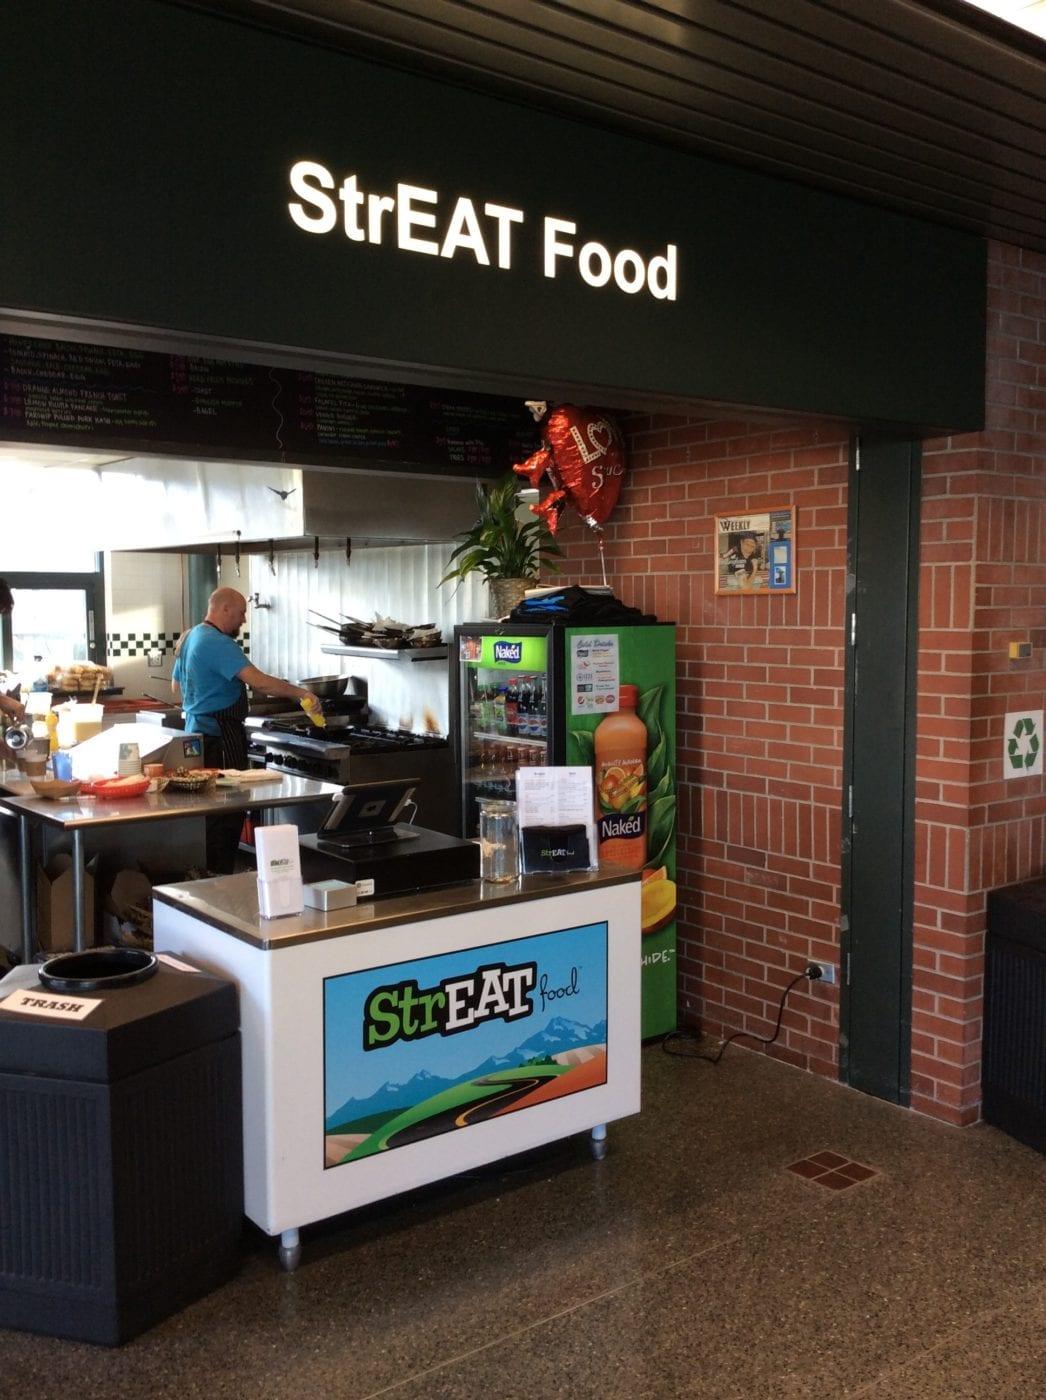 Streat food exterior